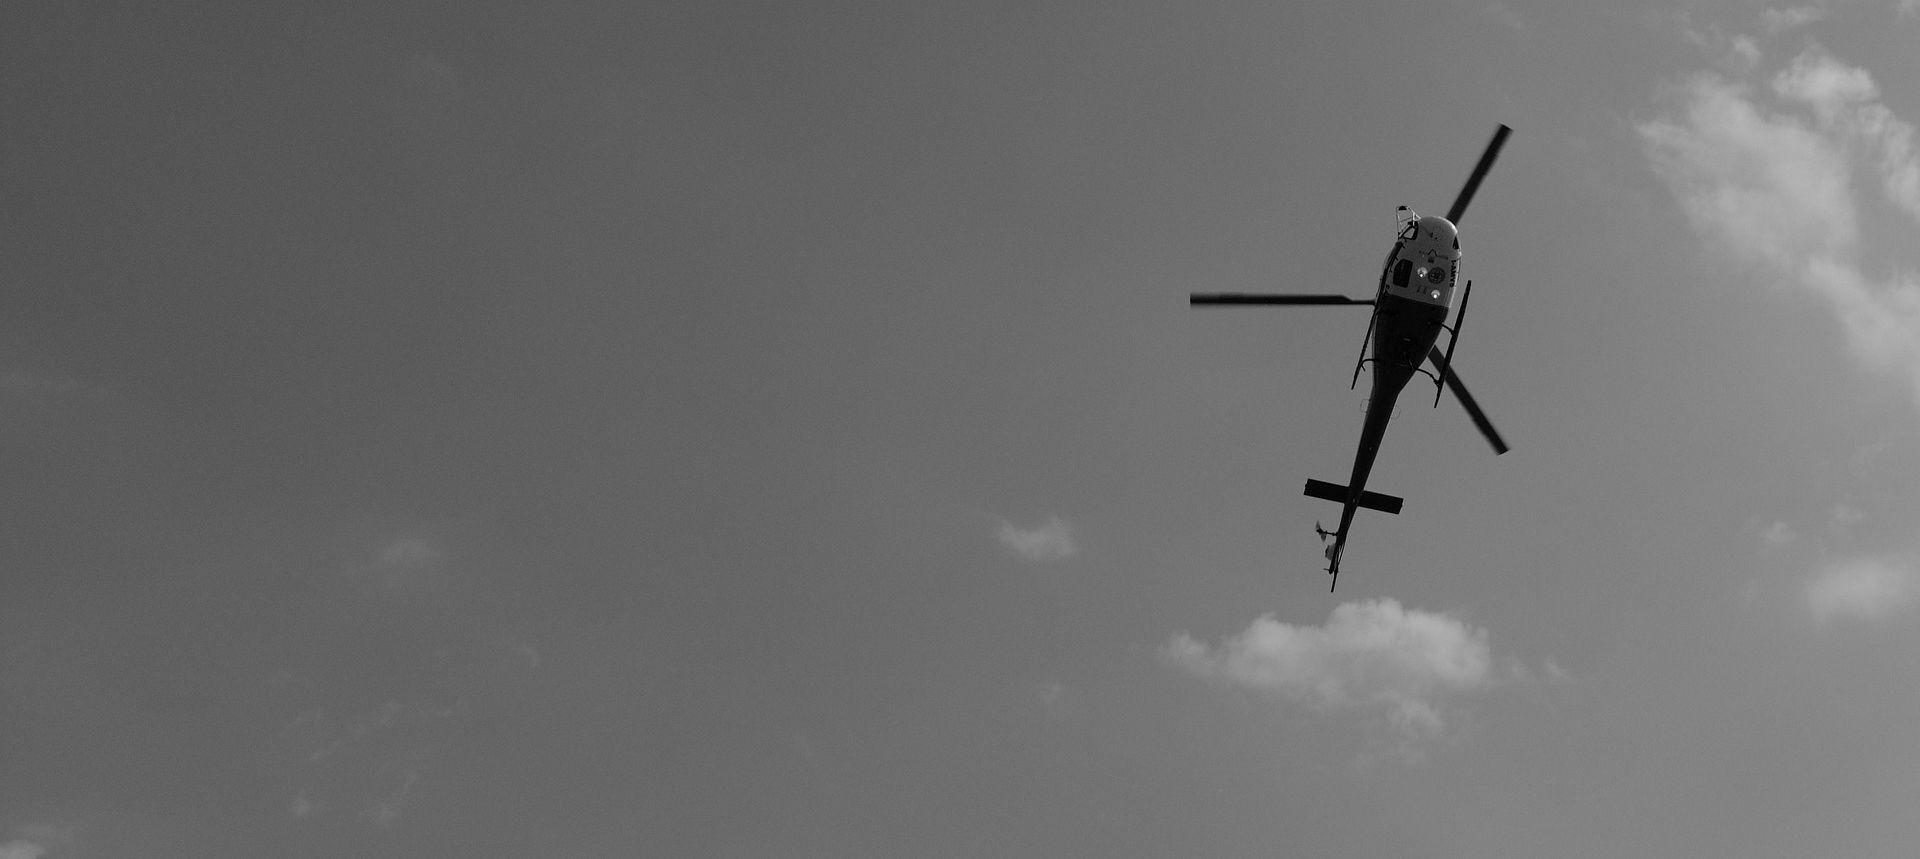 U helikopteru HRZ-a rođena beba